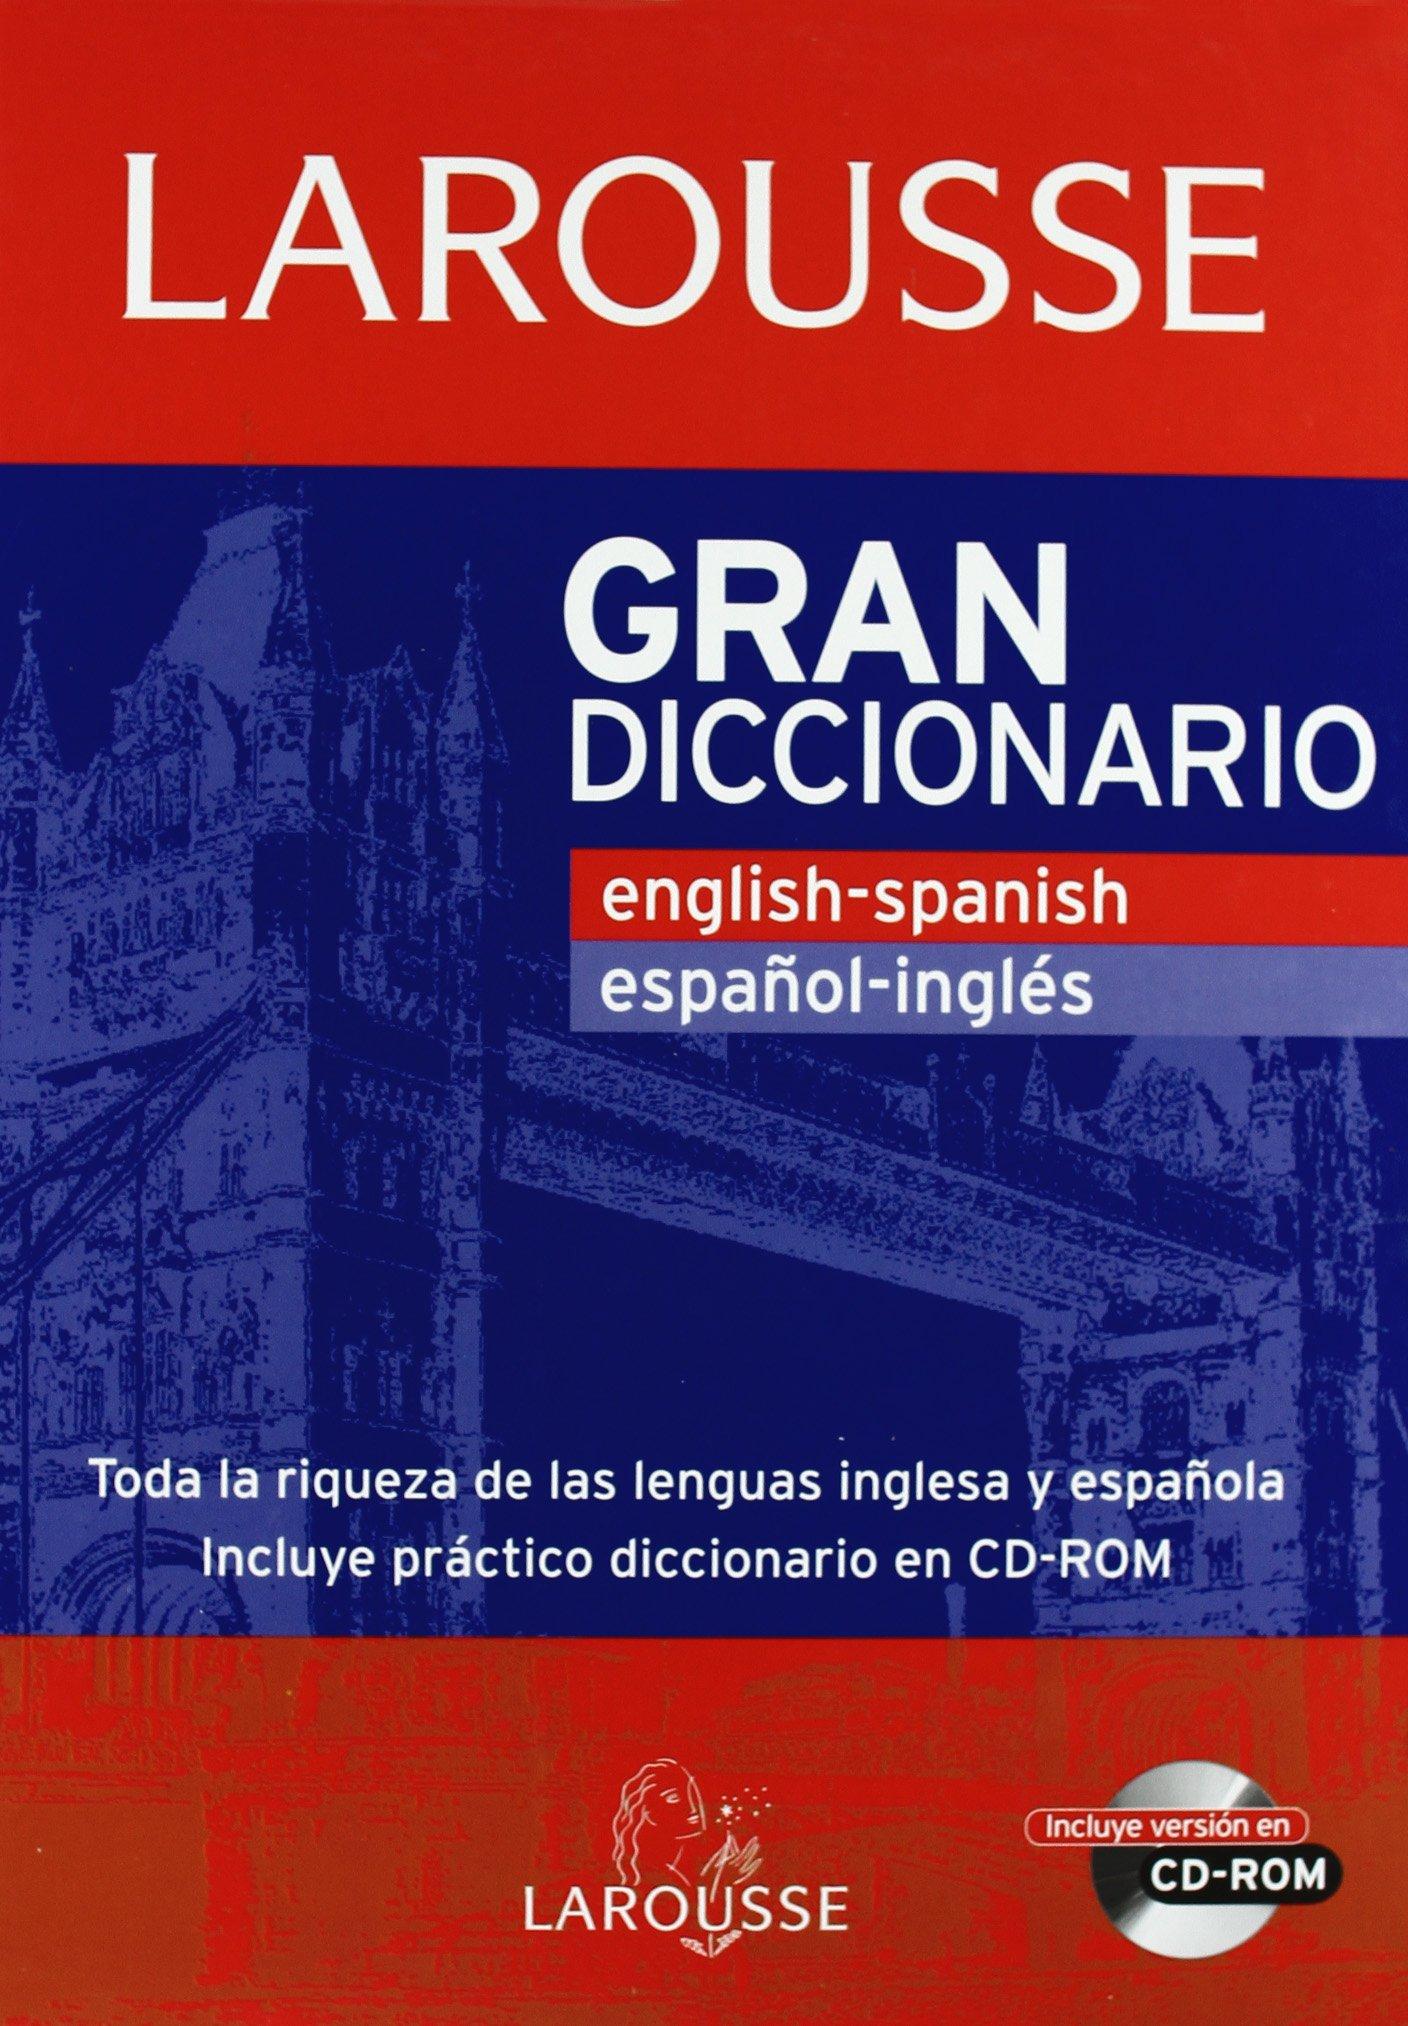 Gran Diccionario English-Spanish / Español-Ingles Larousse - Lengua Inglesa - Diccionarios Generales: Amazon.es: Aa.Vv.: Libros